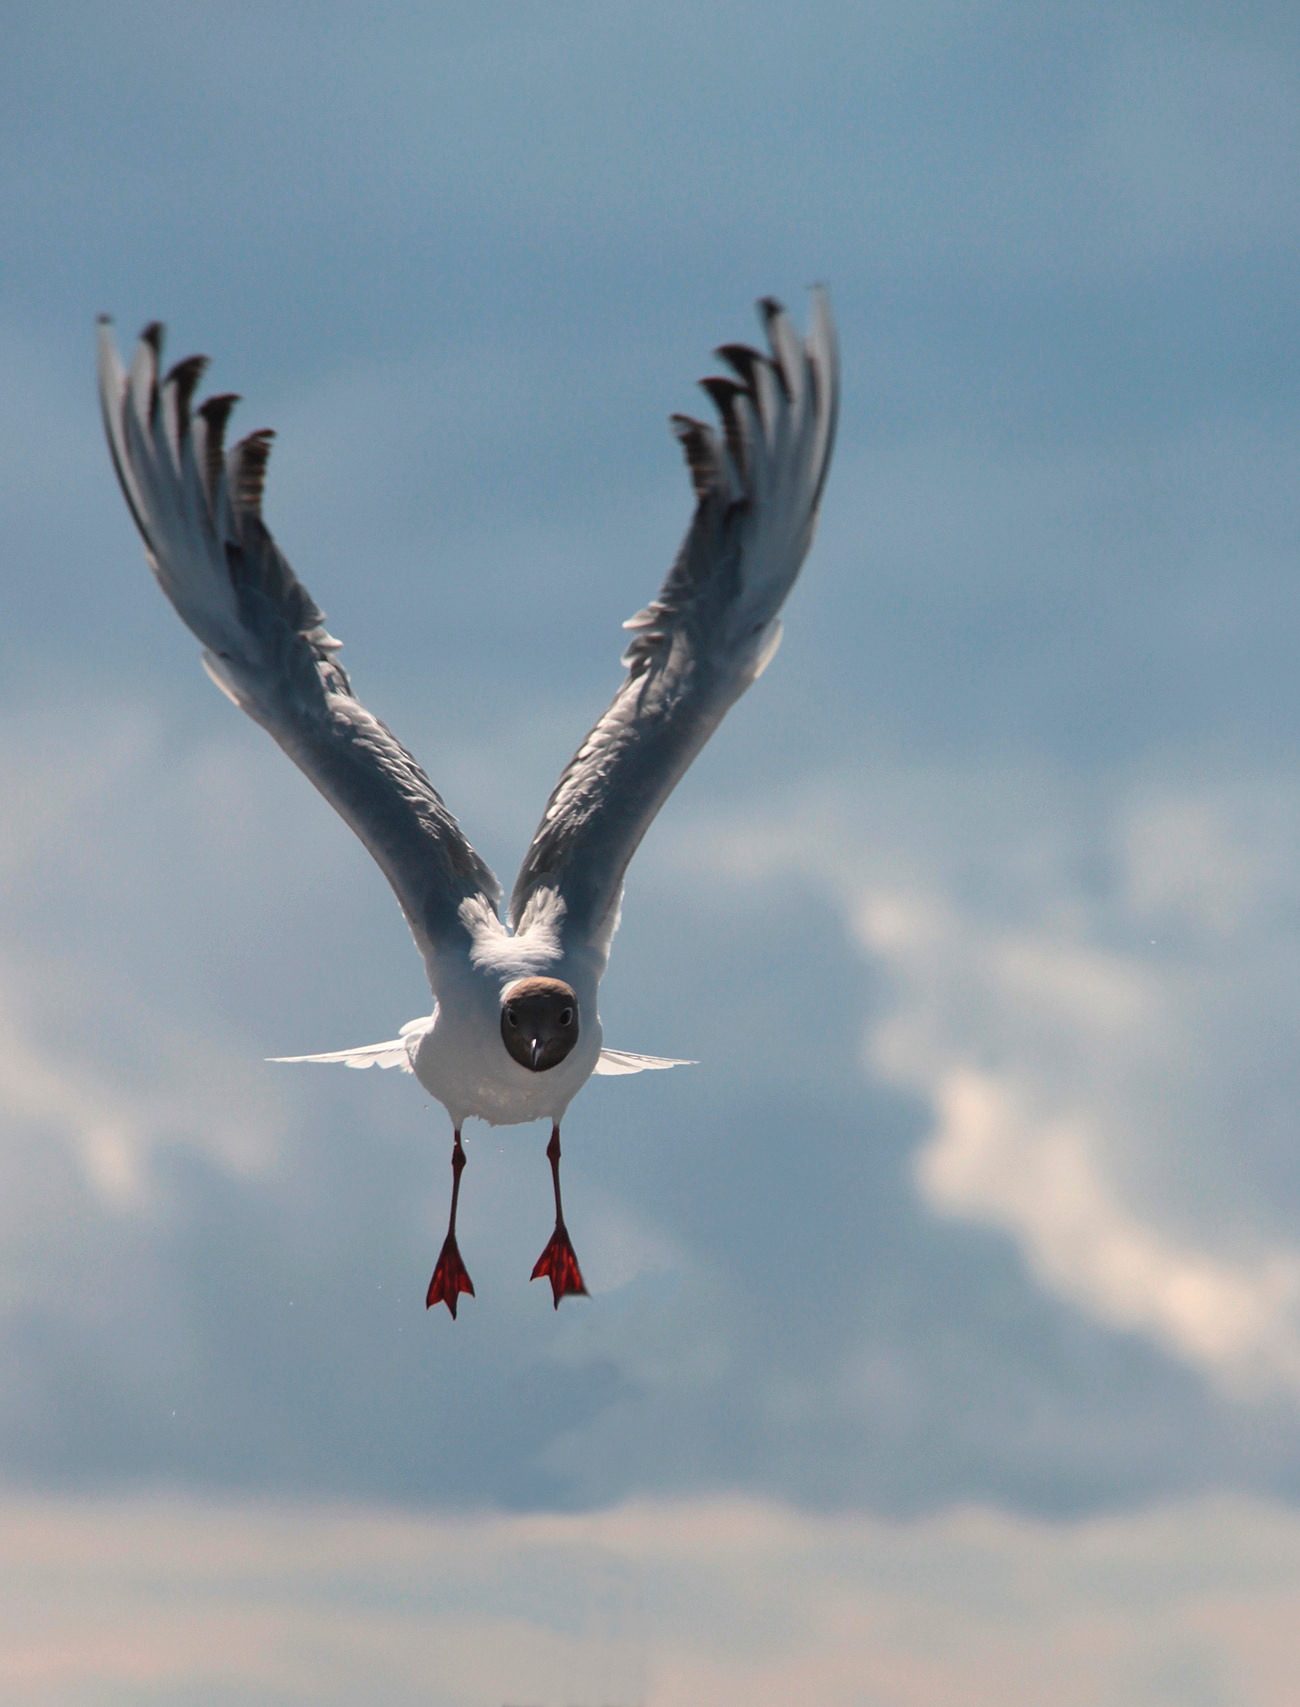 крылья кверху-лапы шире